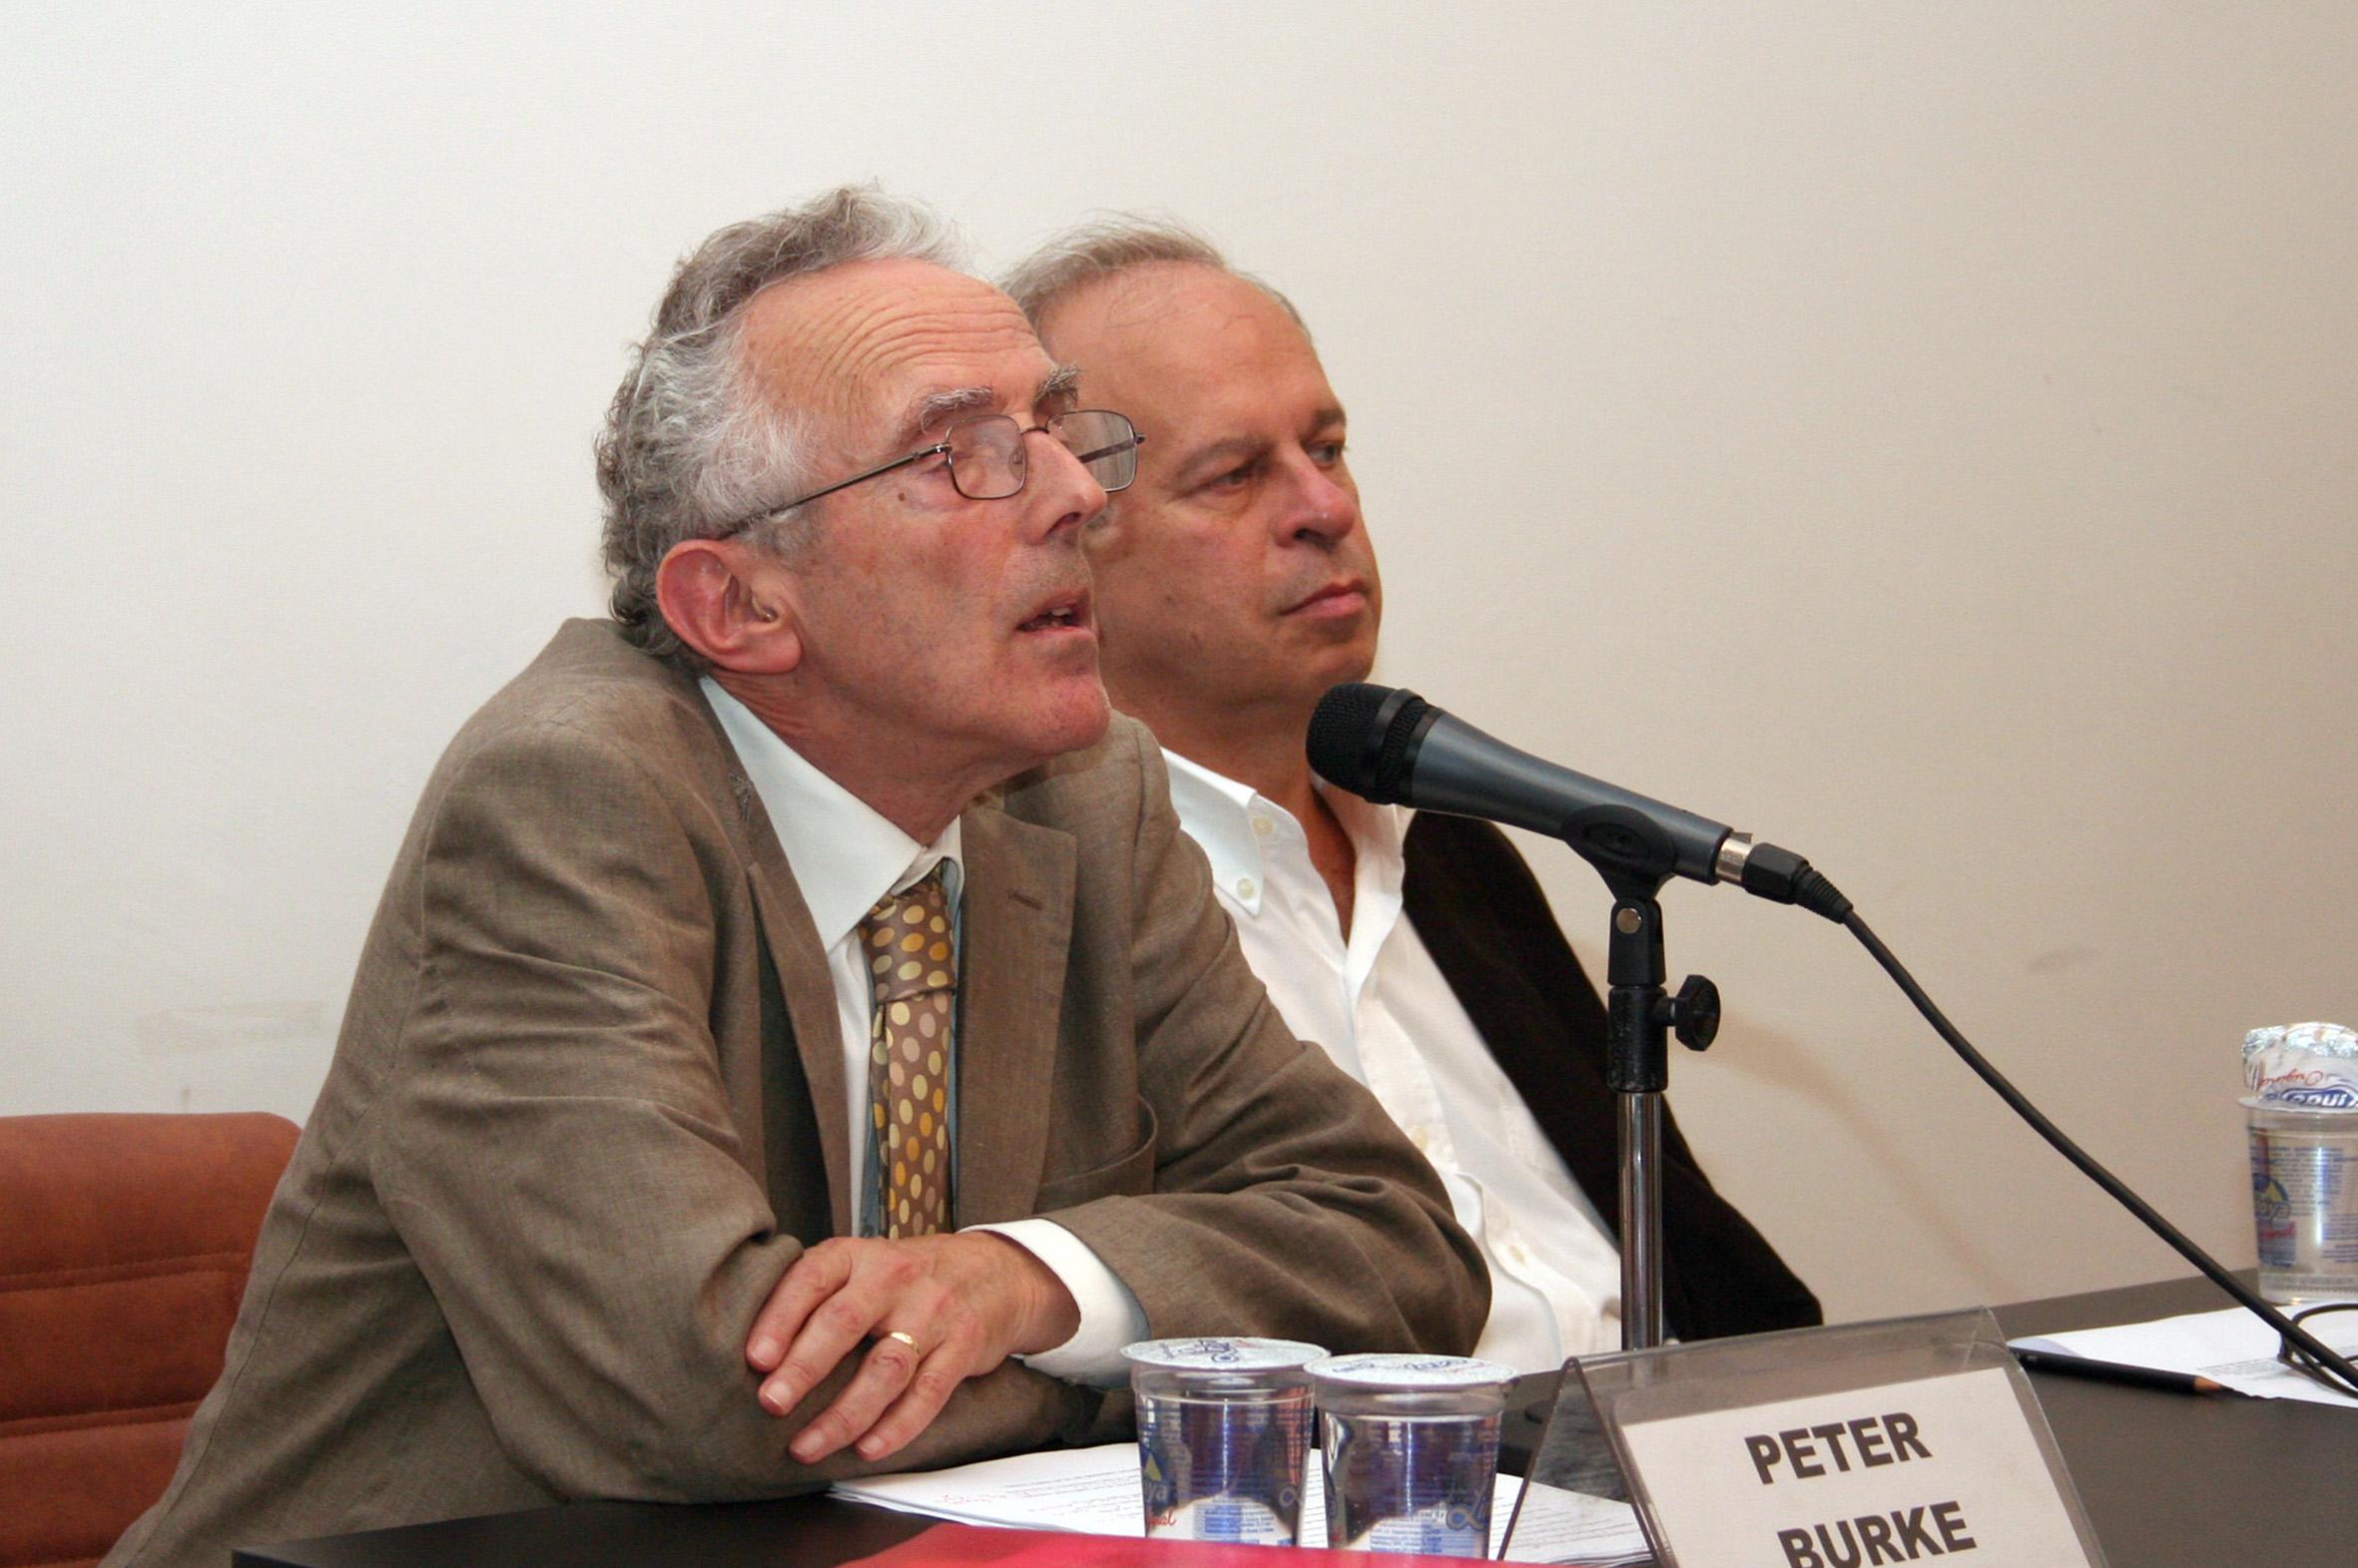 Peter Burke e Renato Janine Ribeiro